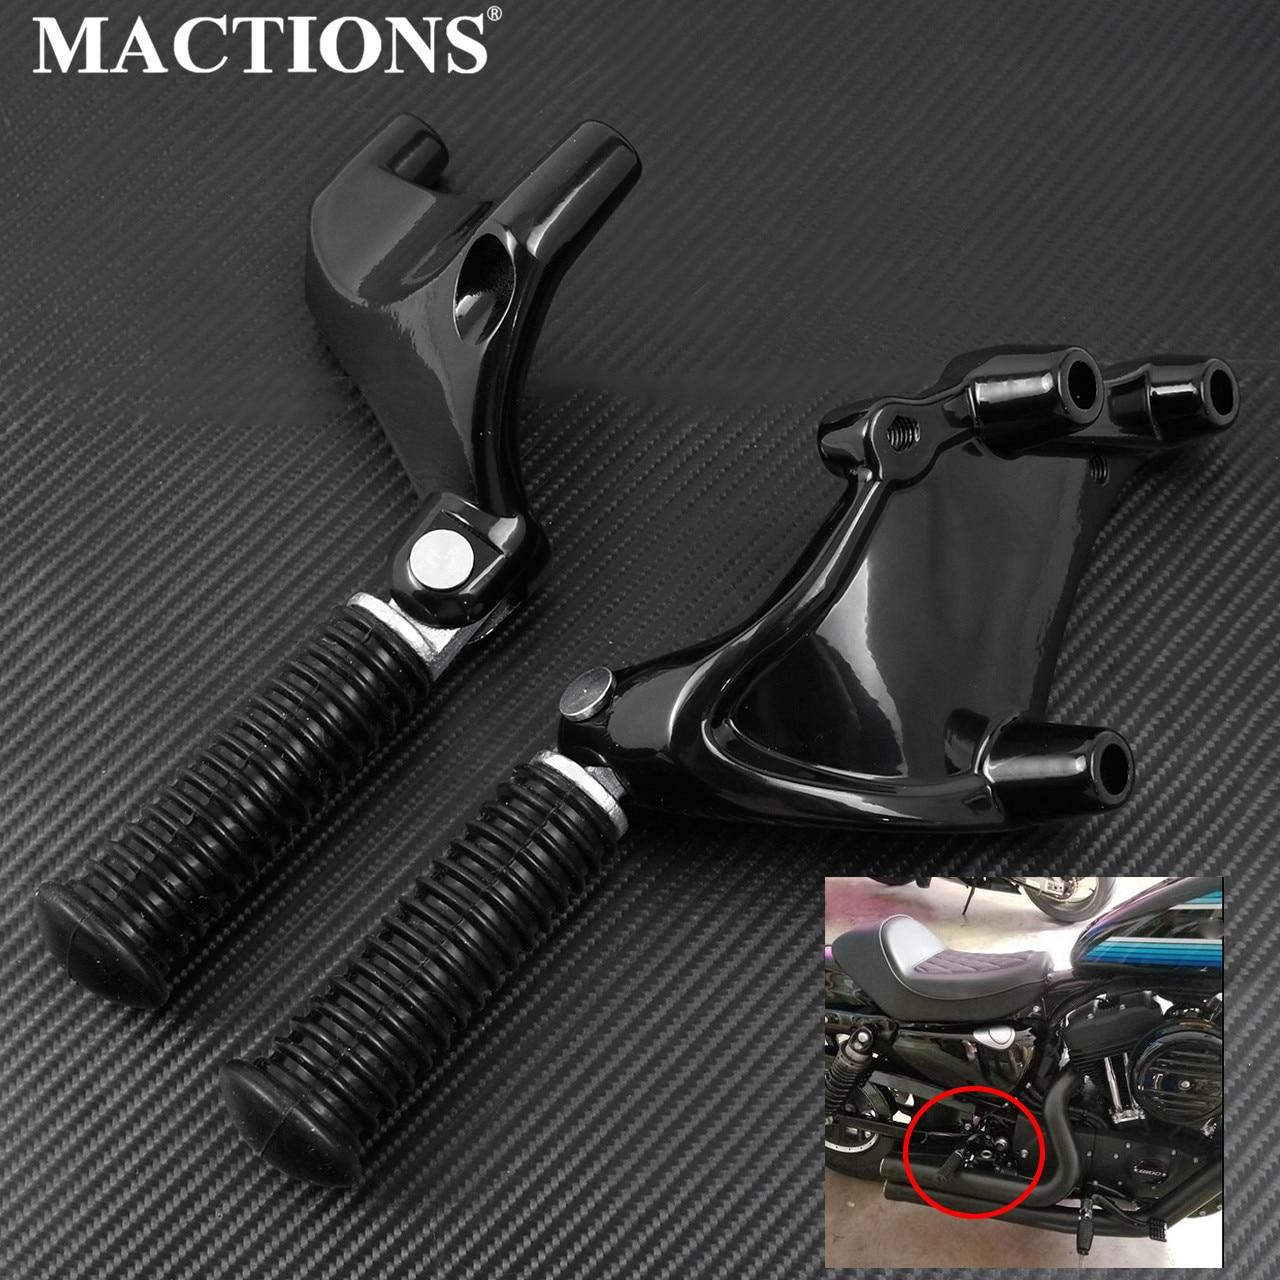 Estribos traseros para pasajero para motocicleta Pedal negro para Harley Sportster Iron 883 1200 XL 48 72 SuperLow 2014-2019